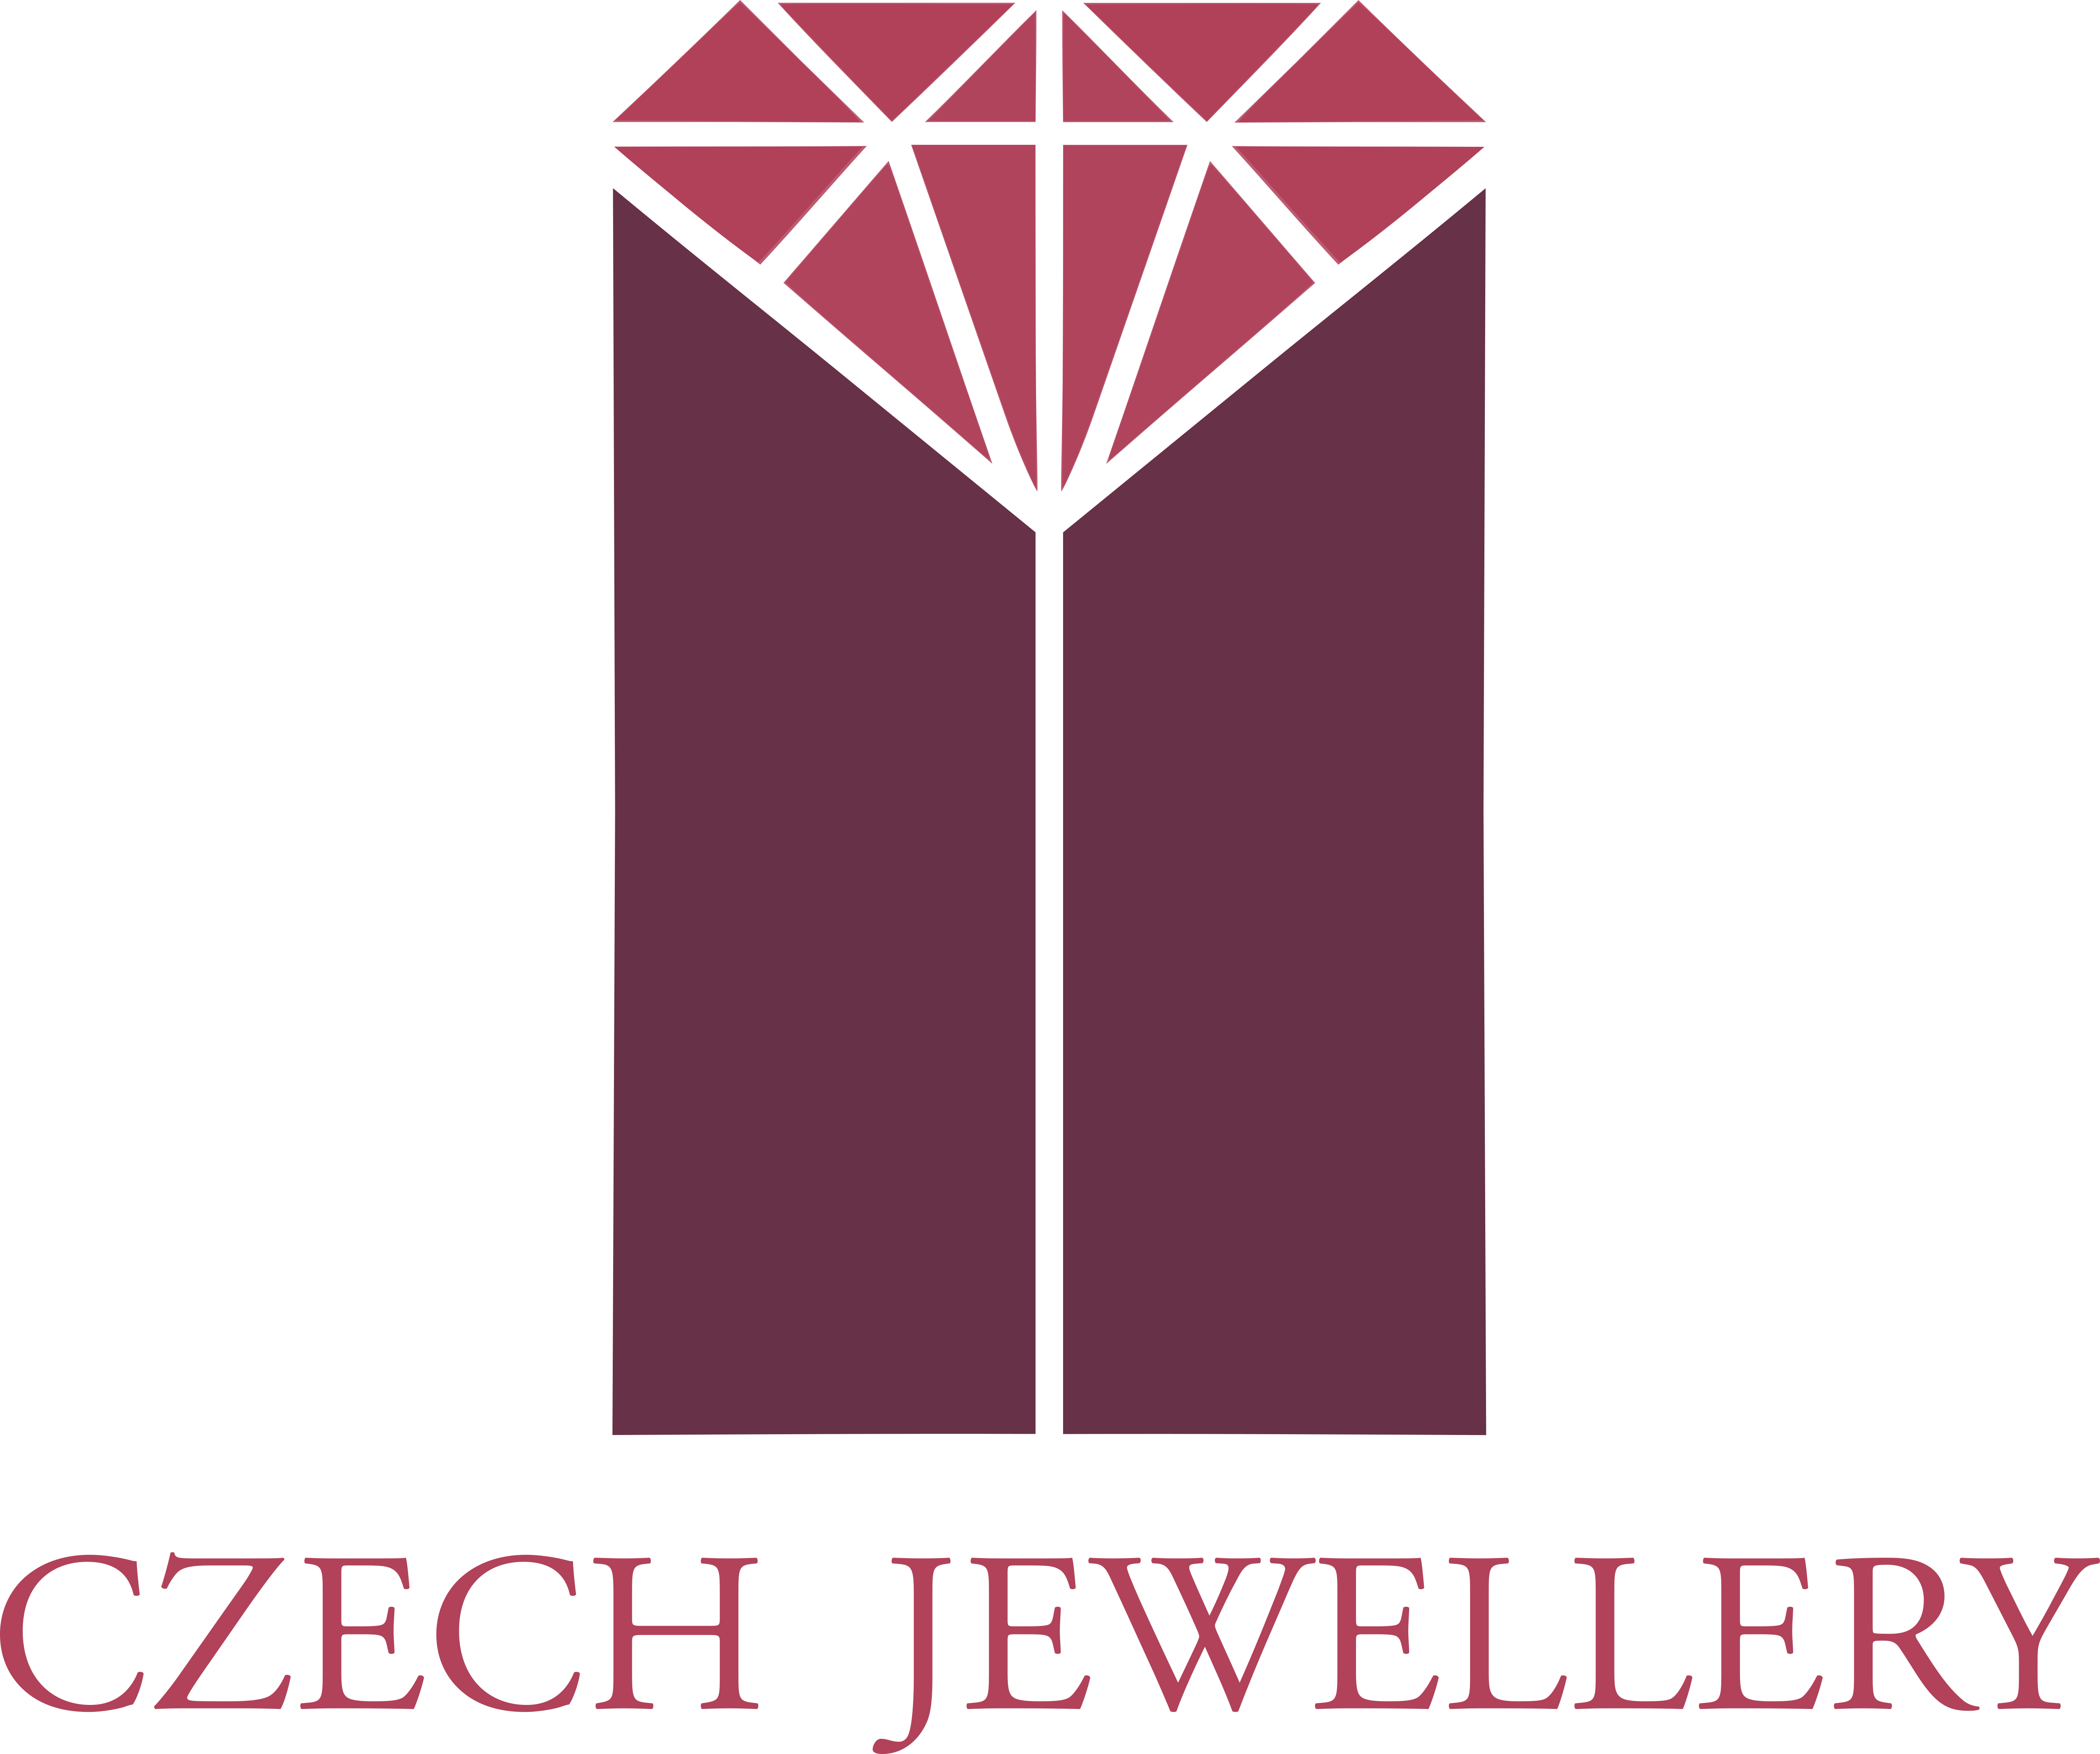 Czech Jewellery